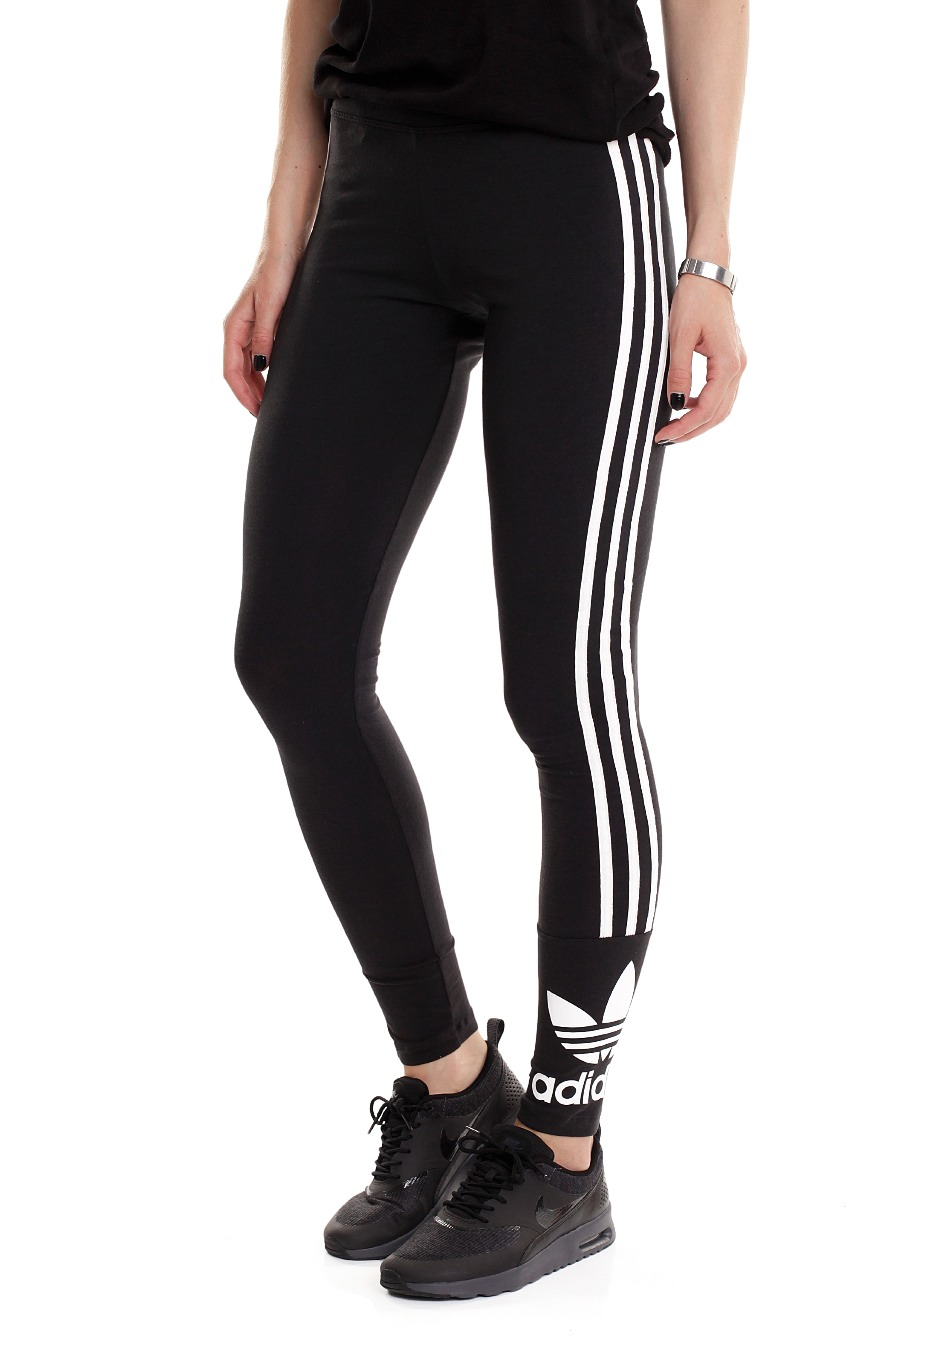 adidas trefoil stripes black core white leggings streetwear shop worldwide. Black Bedroom Furniture Sets. Home Design Ideas